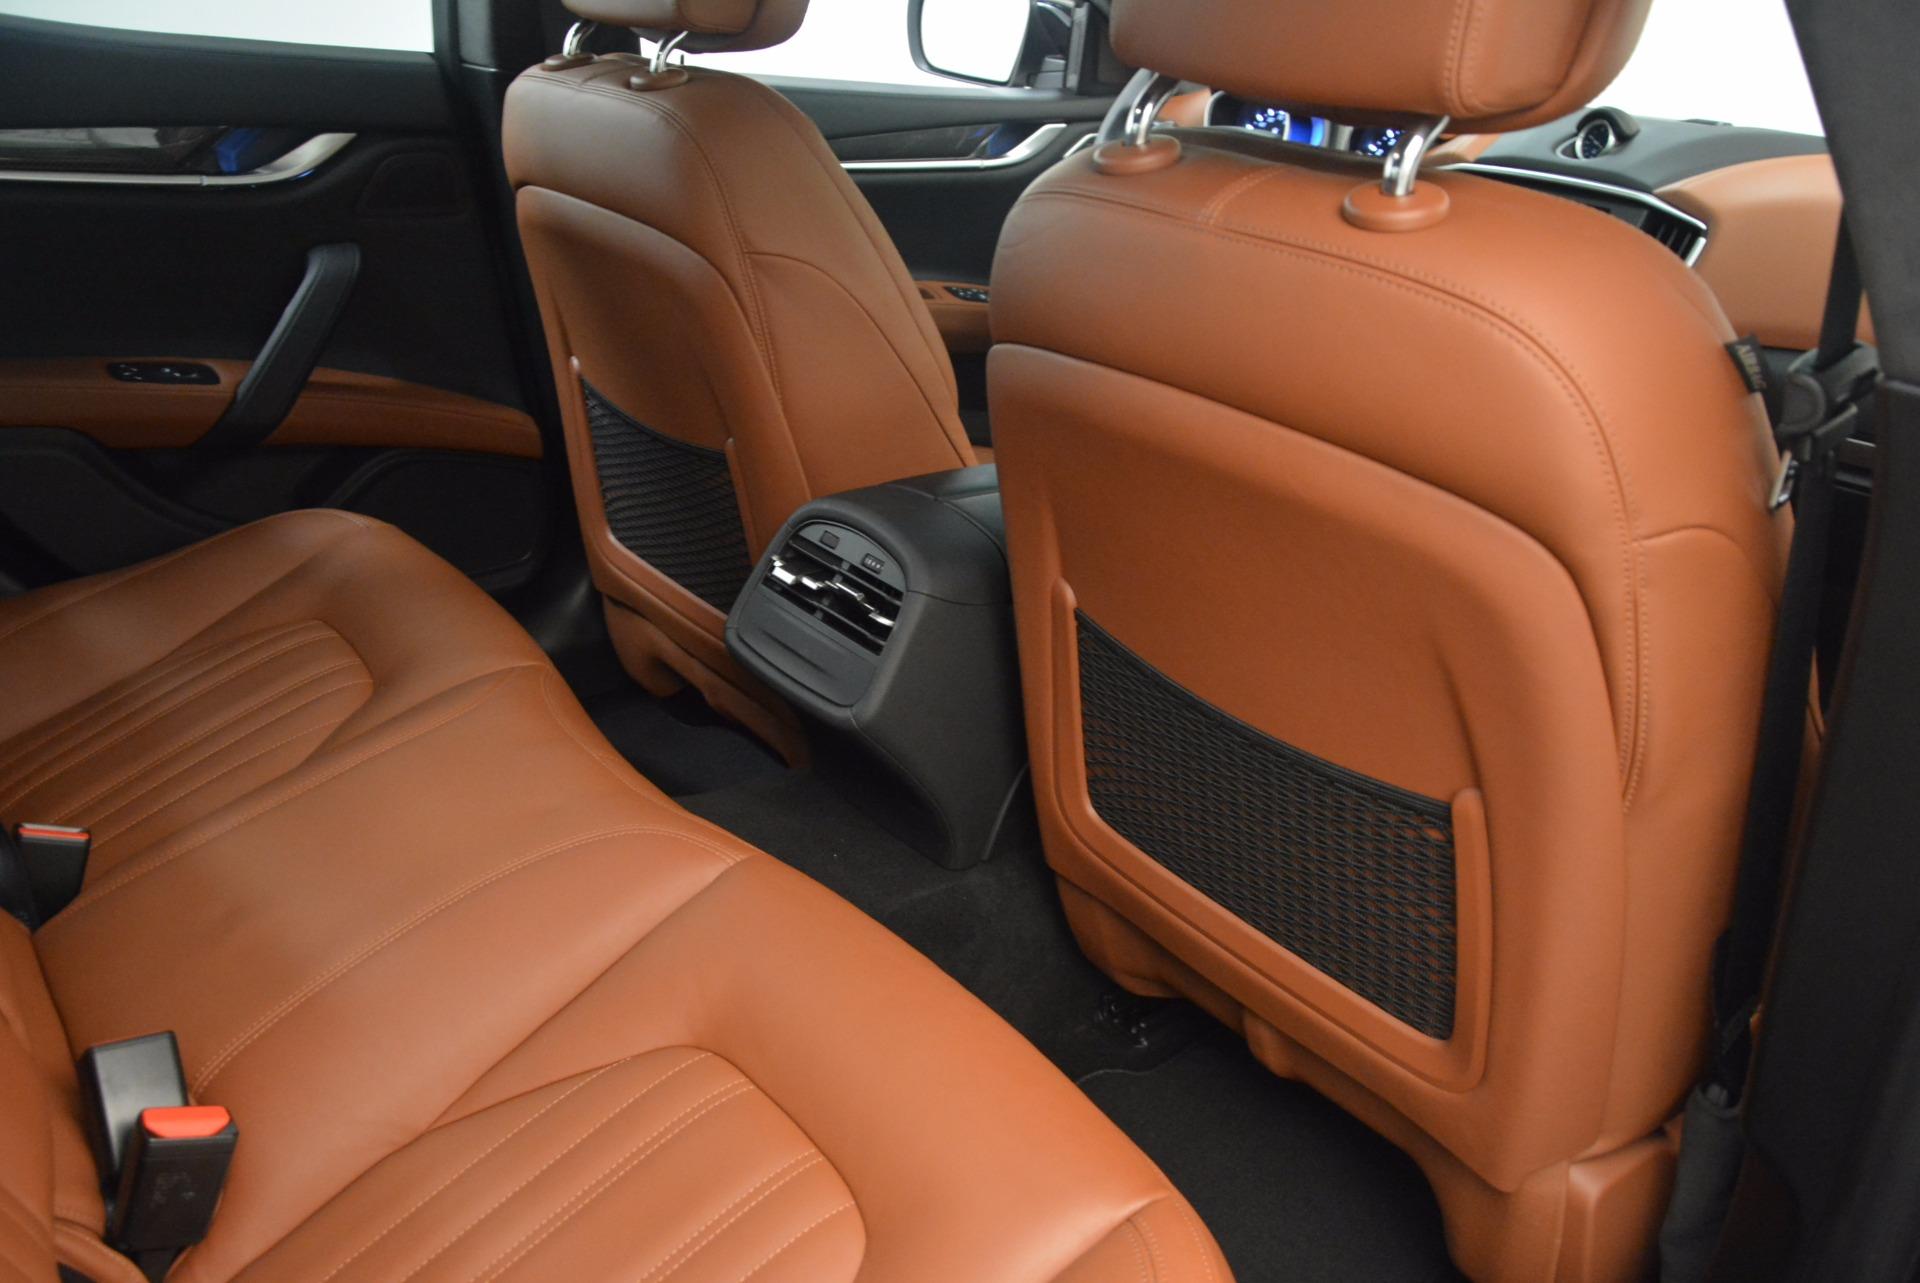 Used 2014 Maserati Ghibli S Q4 For Sale In Greenwich, CT. Alfa Romeo of Greenwich, 7281 1587_p20